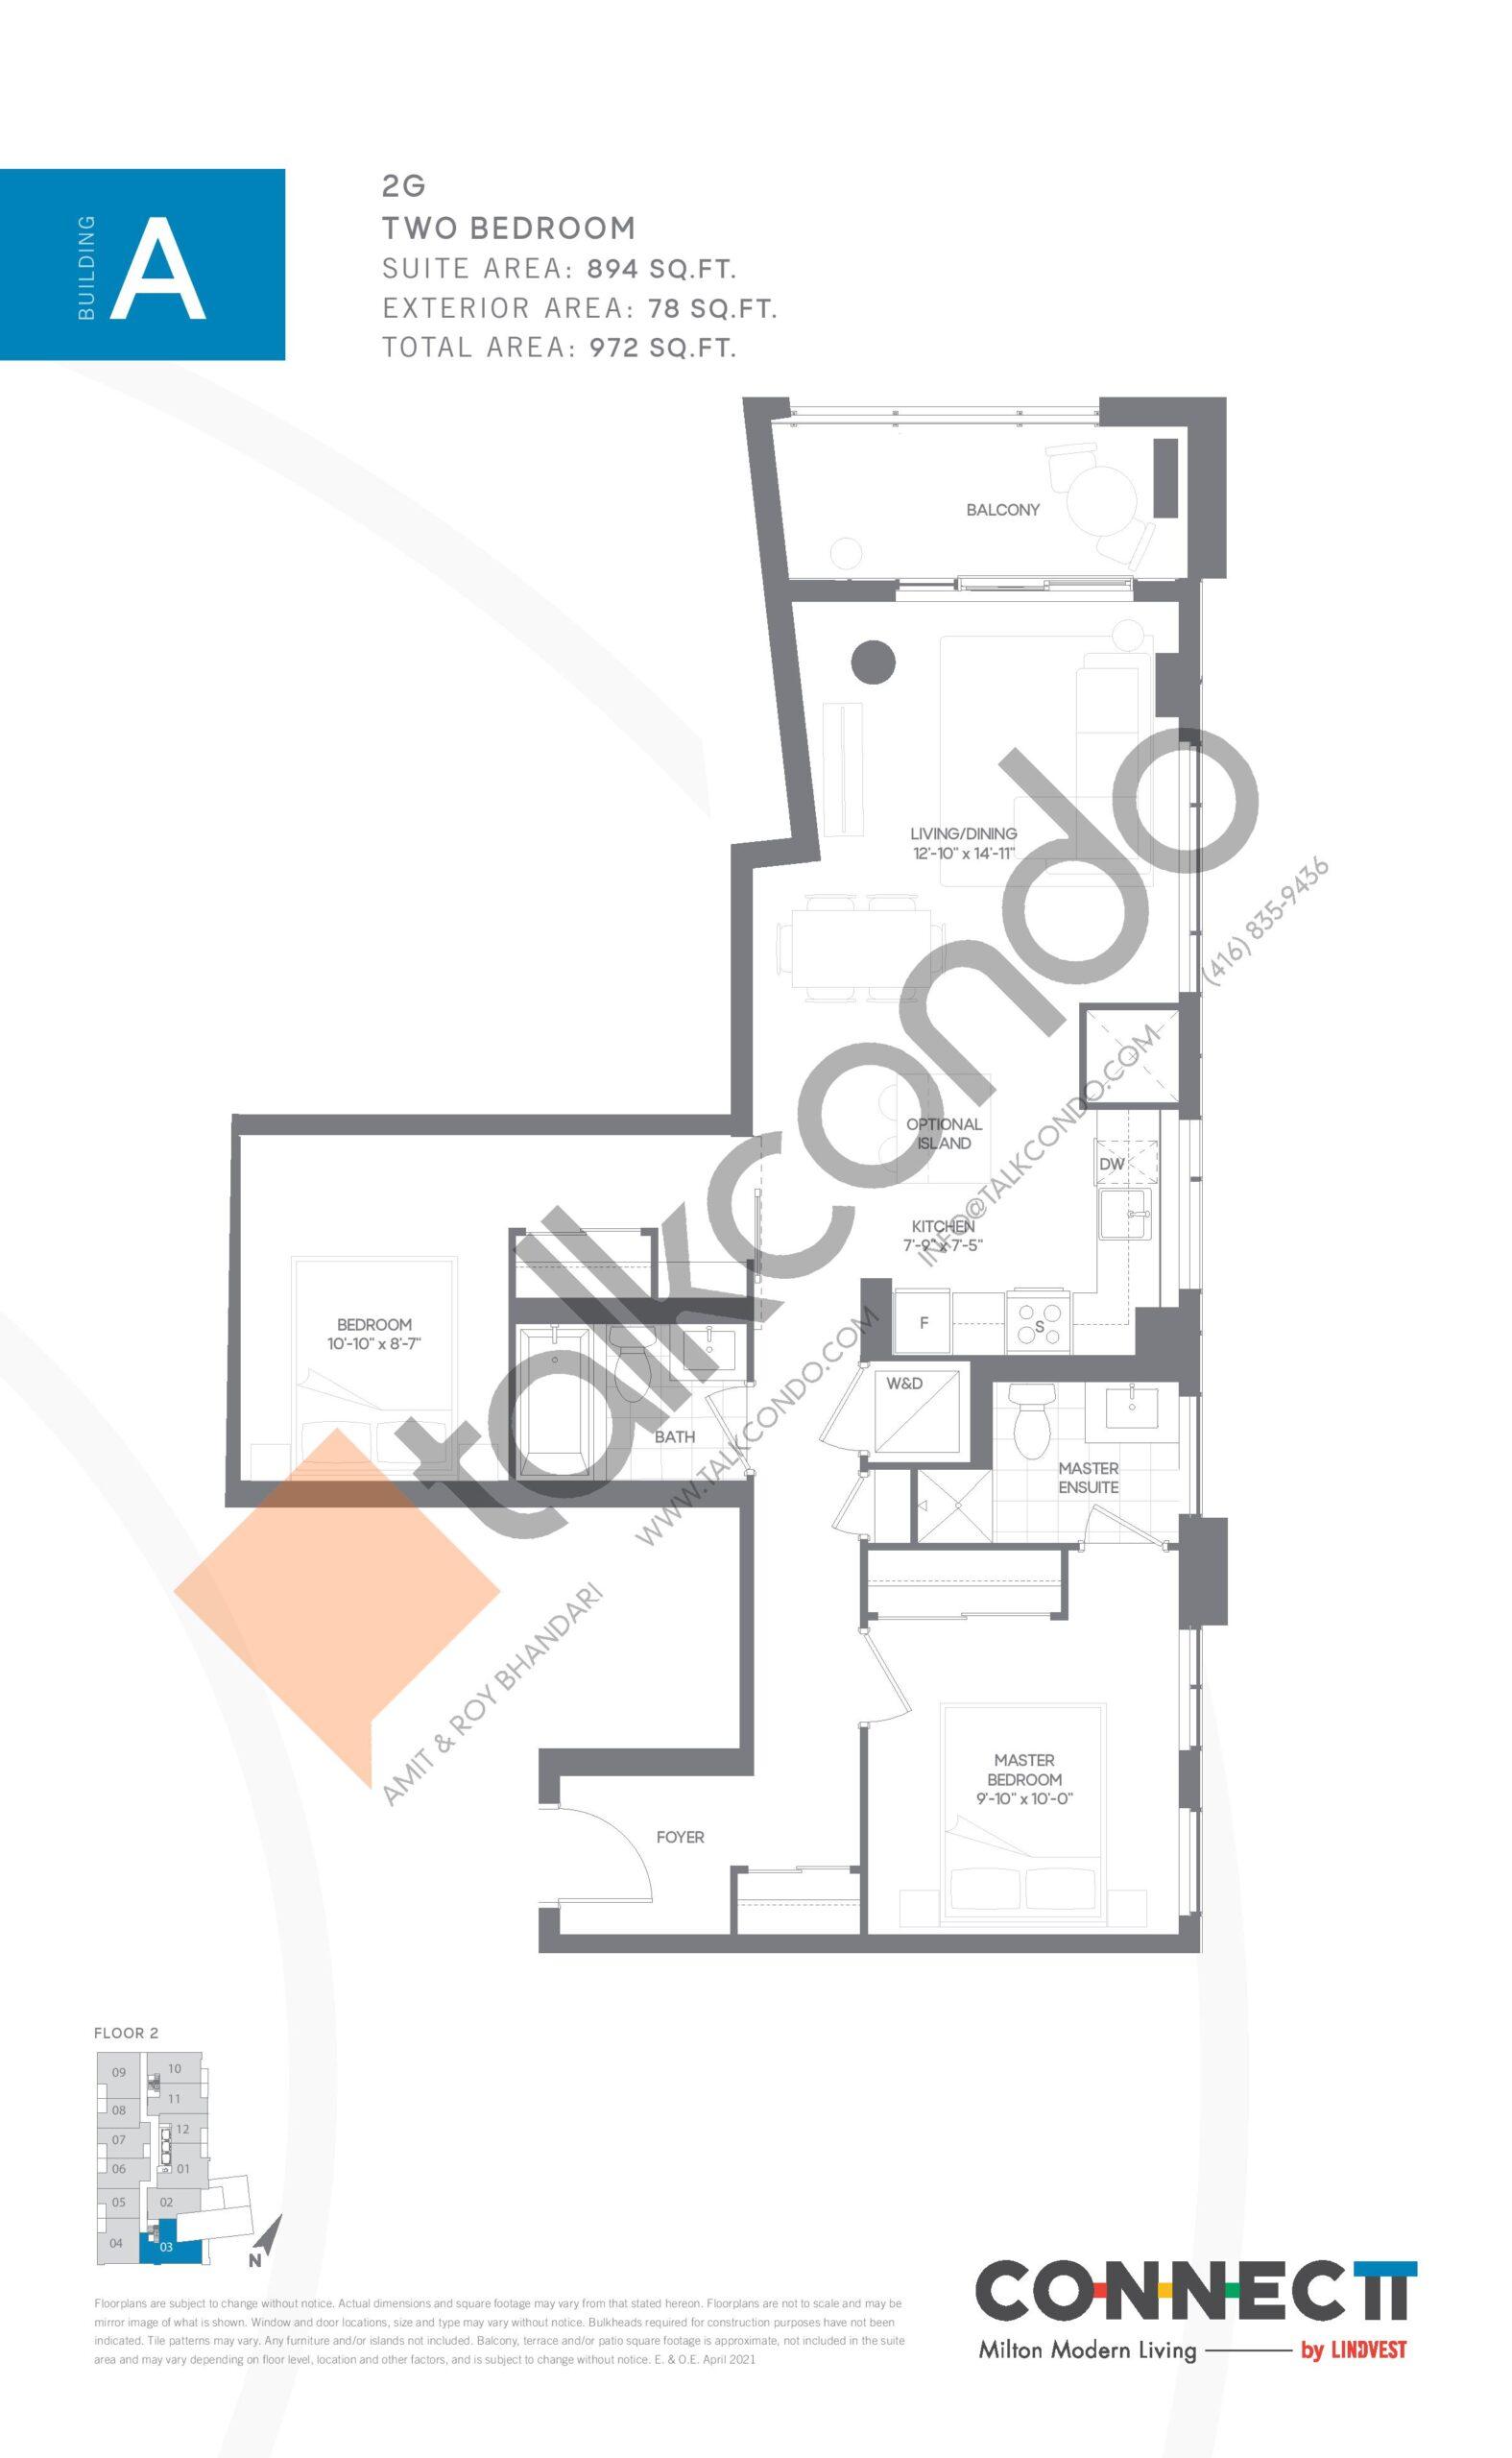 2G Floor Plan at Connectt Urban Community Condos - 894 sq.ft